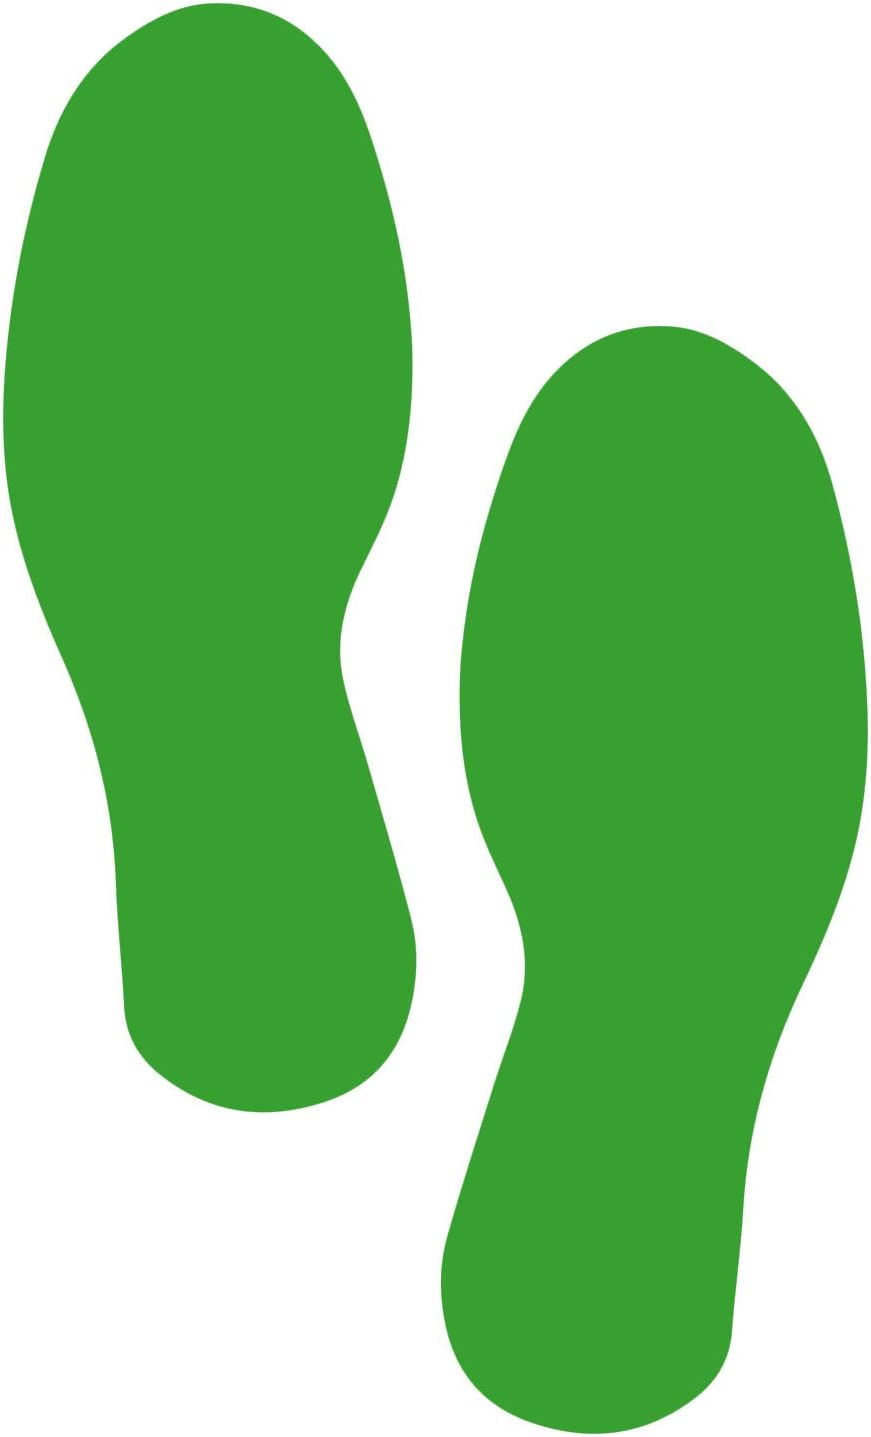 5S Premium 12 inch Footprint Floor Markers 10 pk 5 Yellow Right 5 Green Left